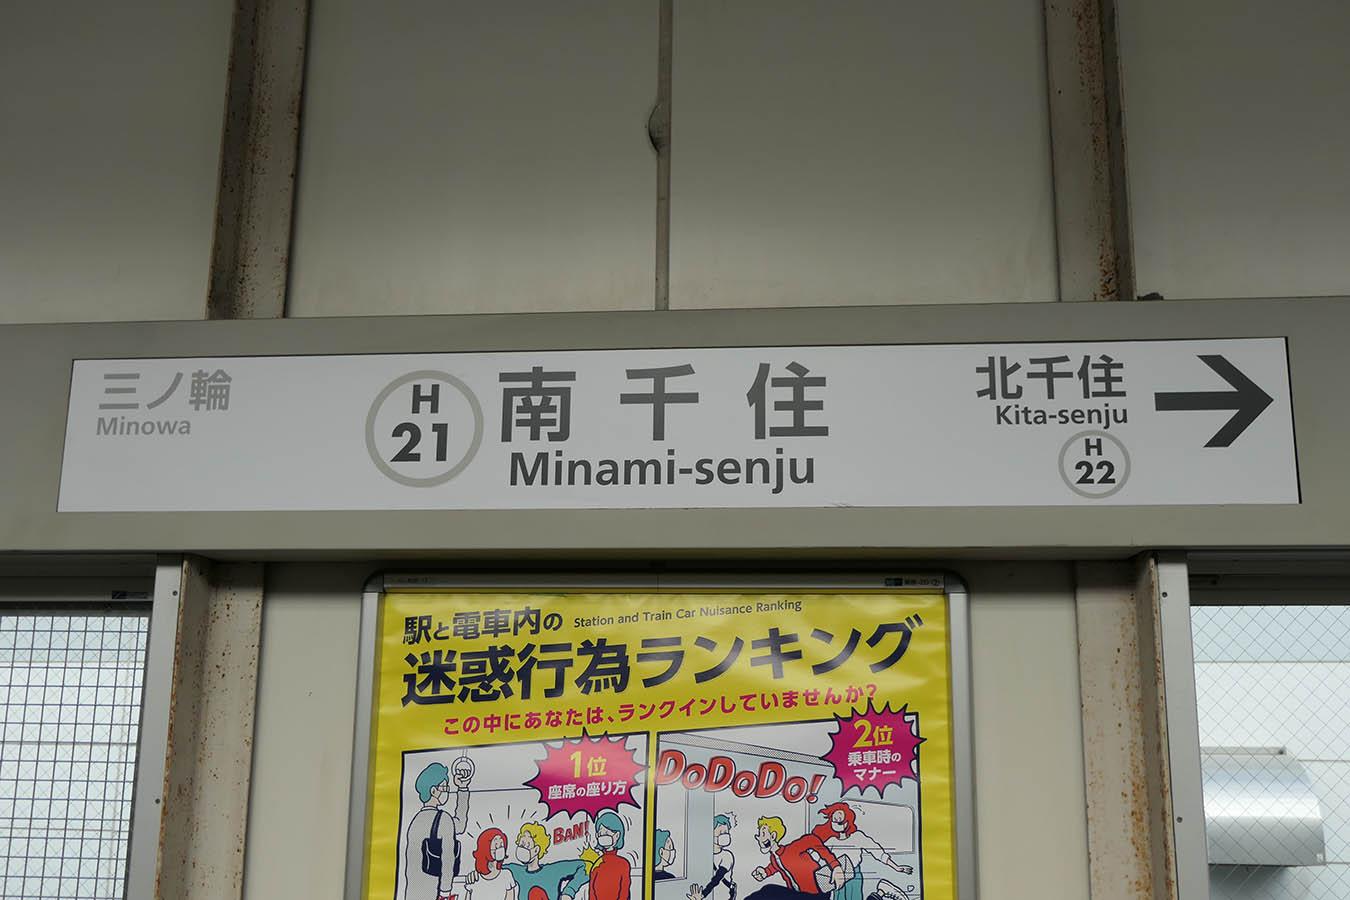 H21_photo04.jpg